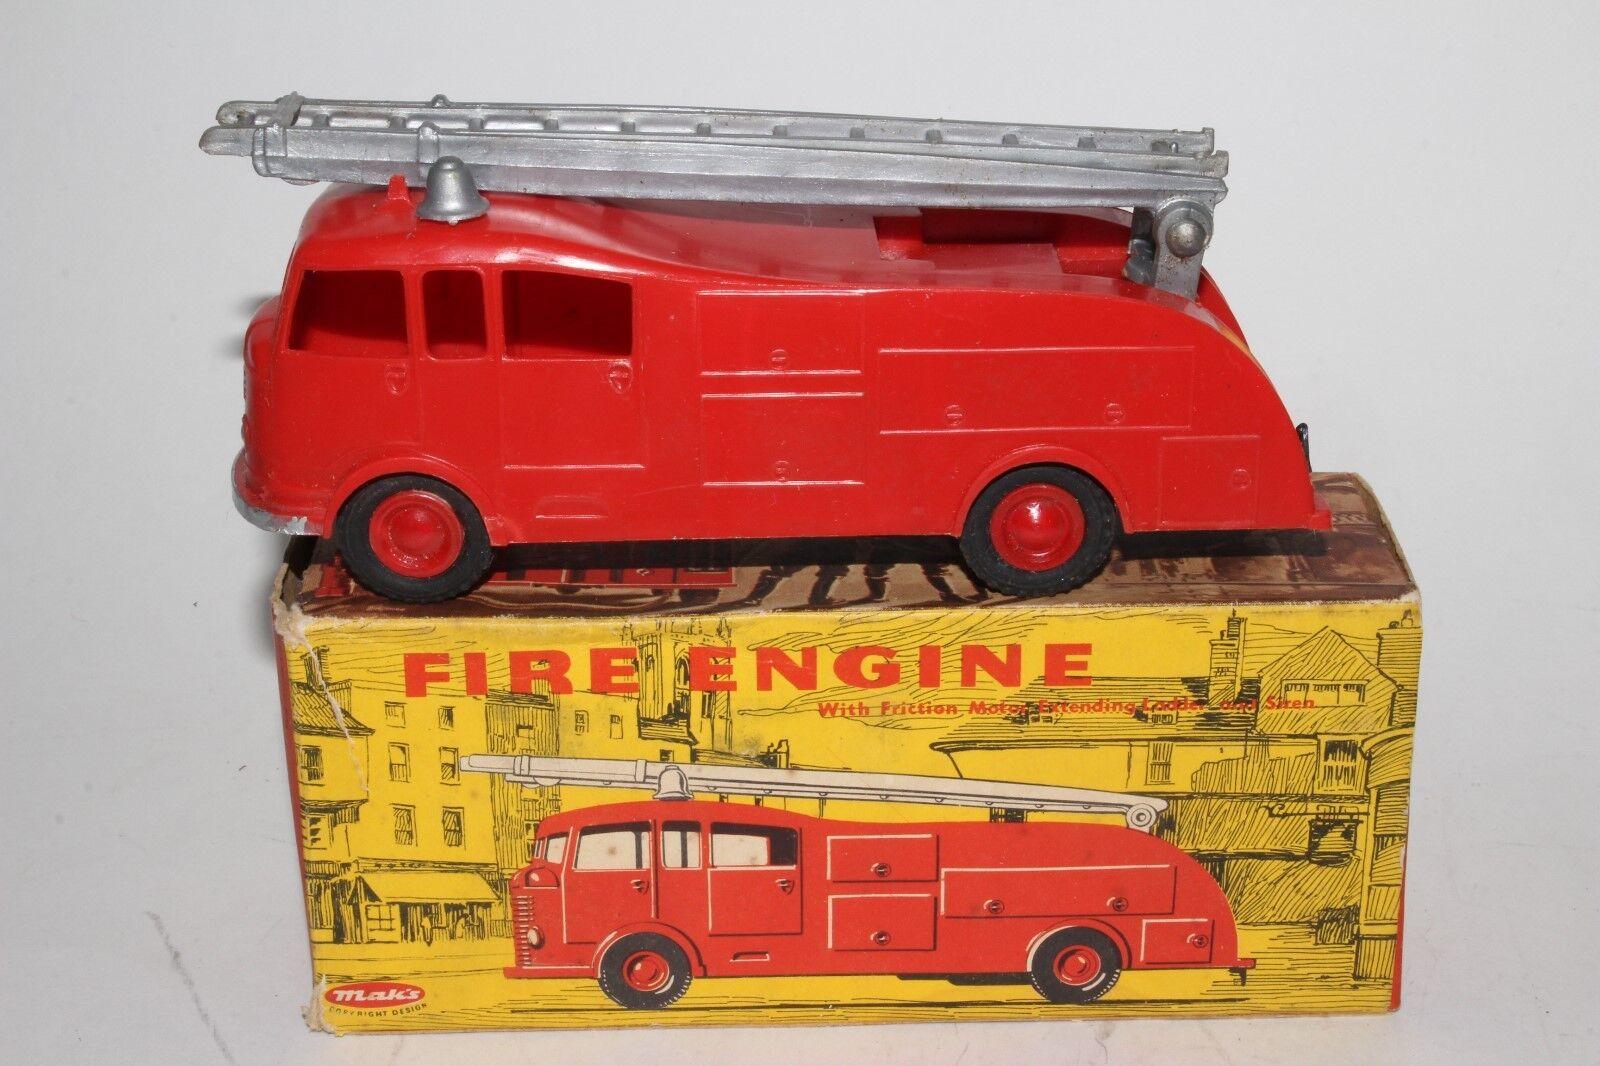 597ms Maks Juguetes, Hecho en Hong Kong Plástico Camión de Bomberos con Original